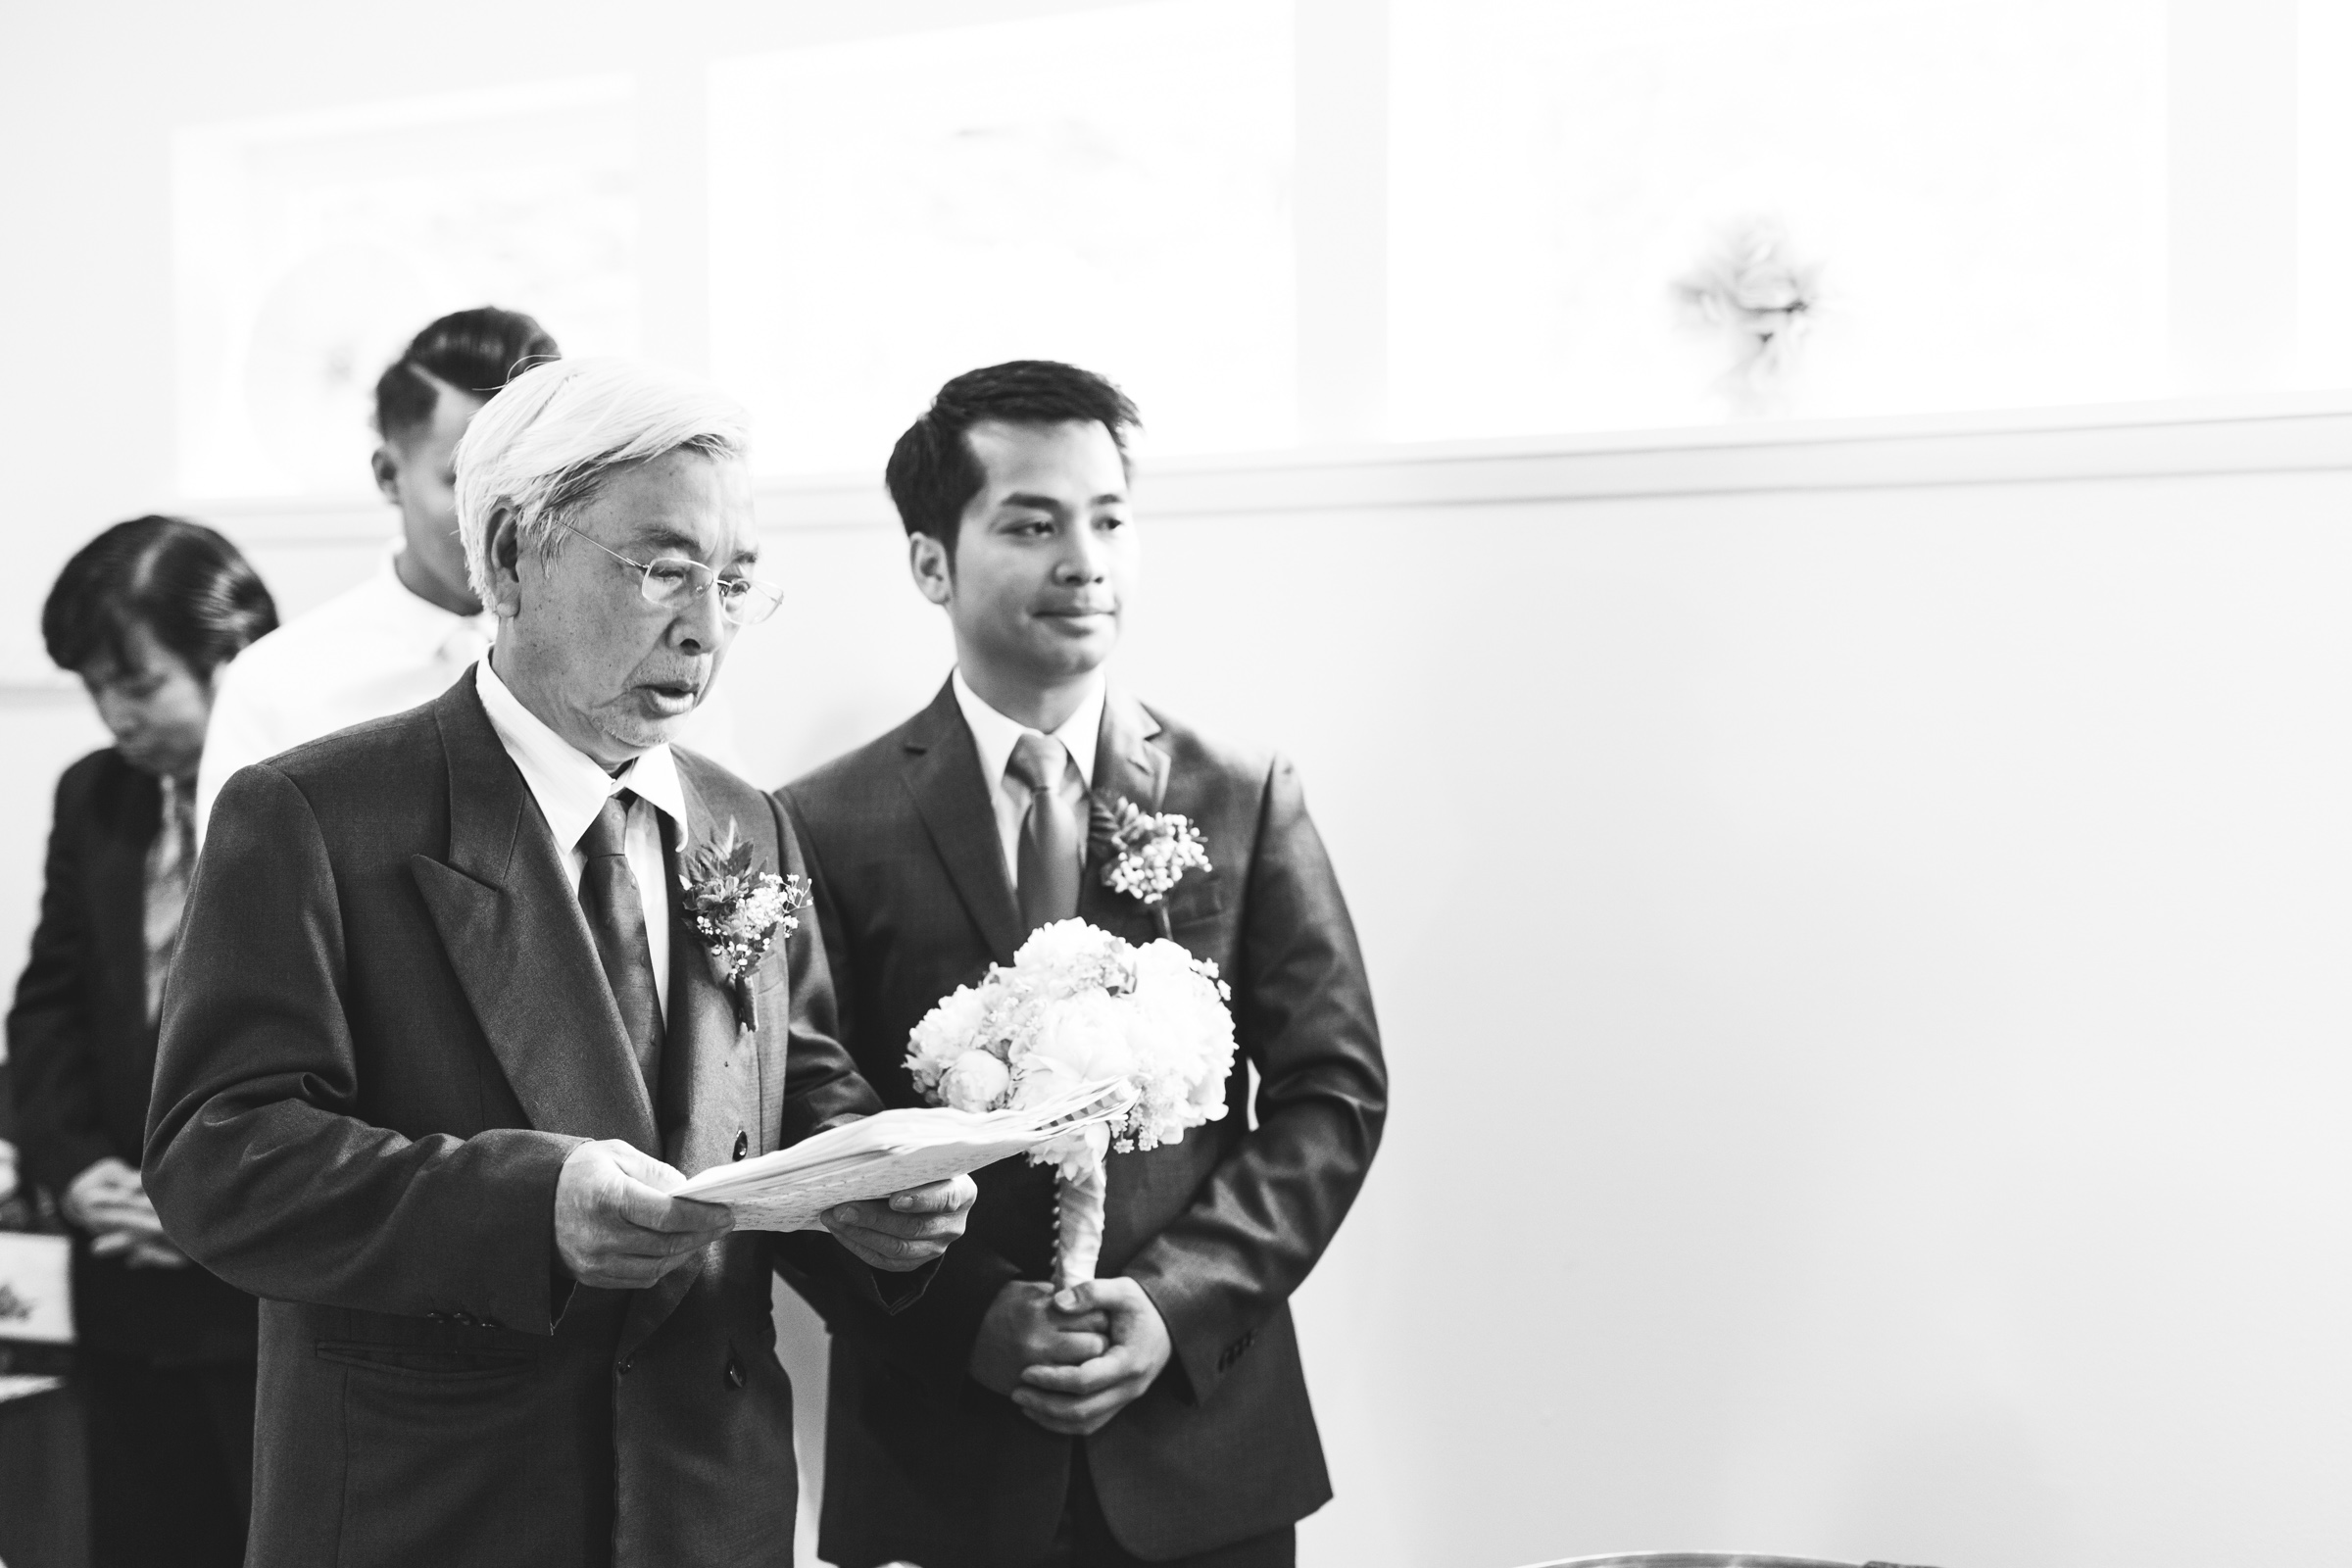 NancyVu-Renton-Wedding-062516-0060-2.jpg